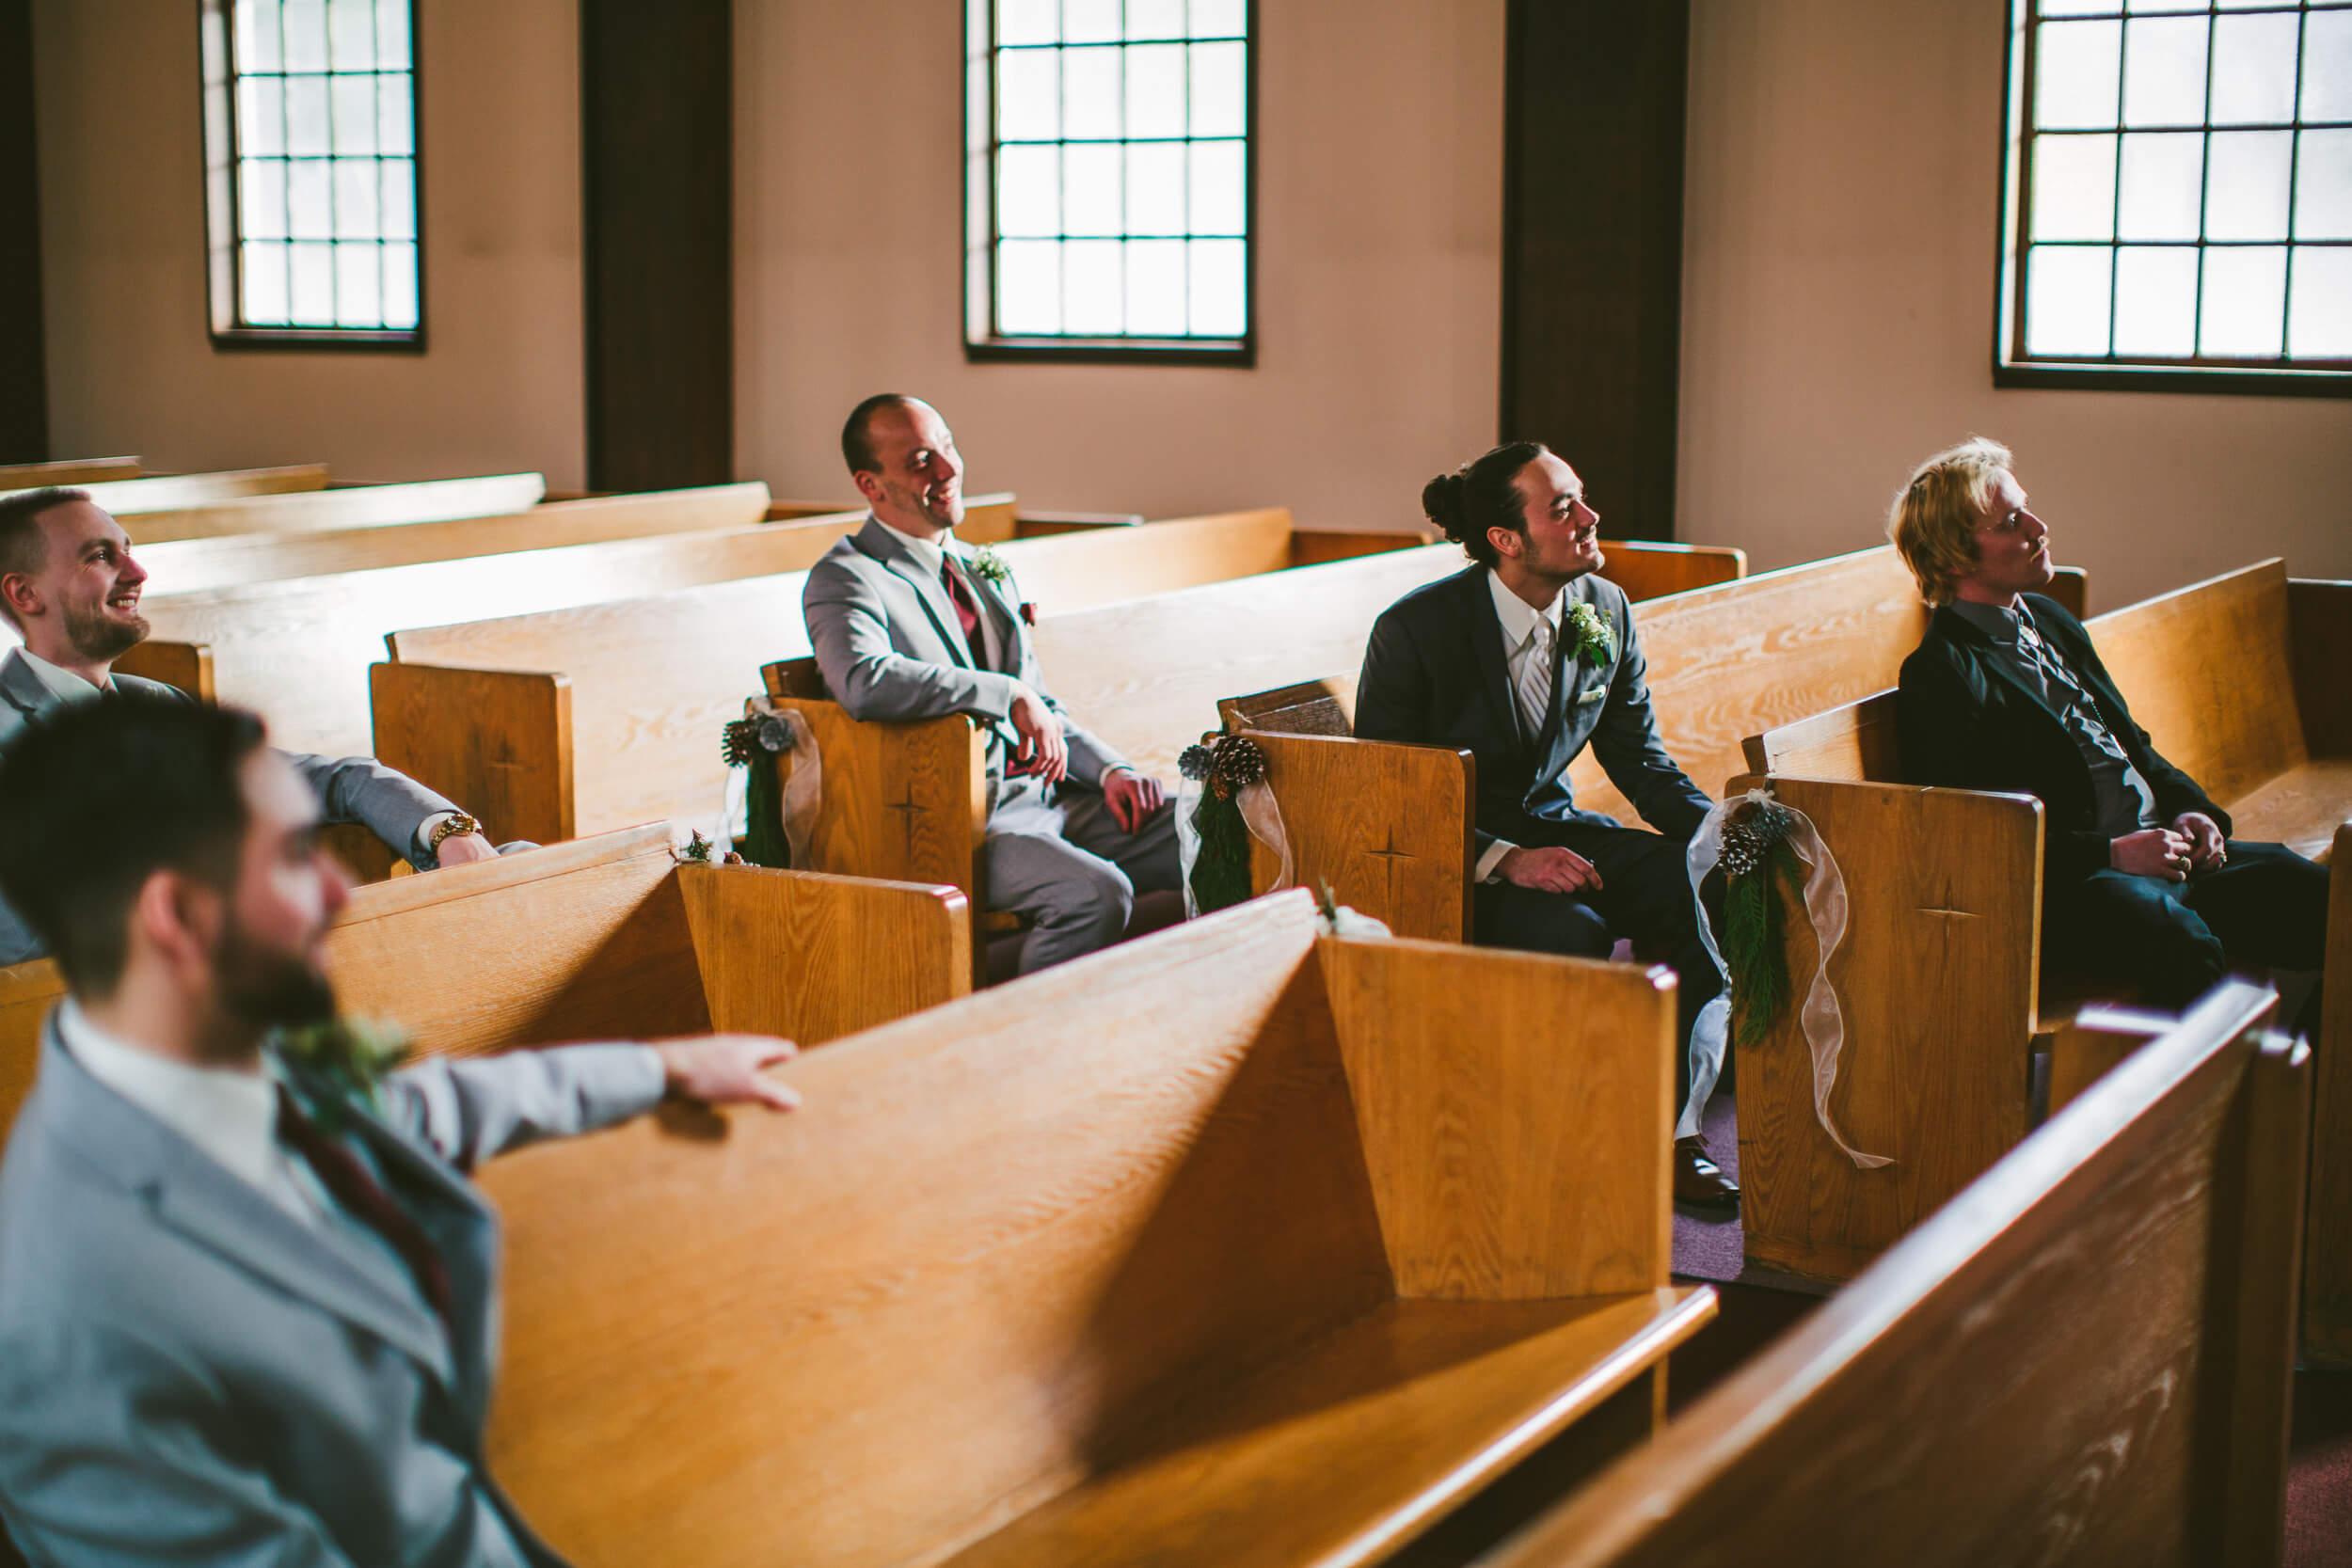 mukogawa winter wedding in spokane (21).jpg